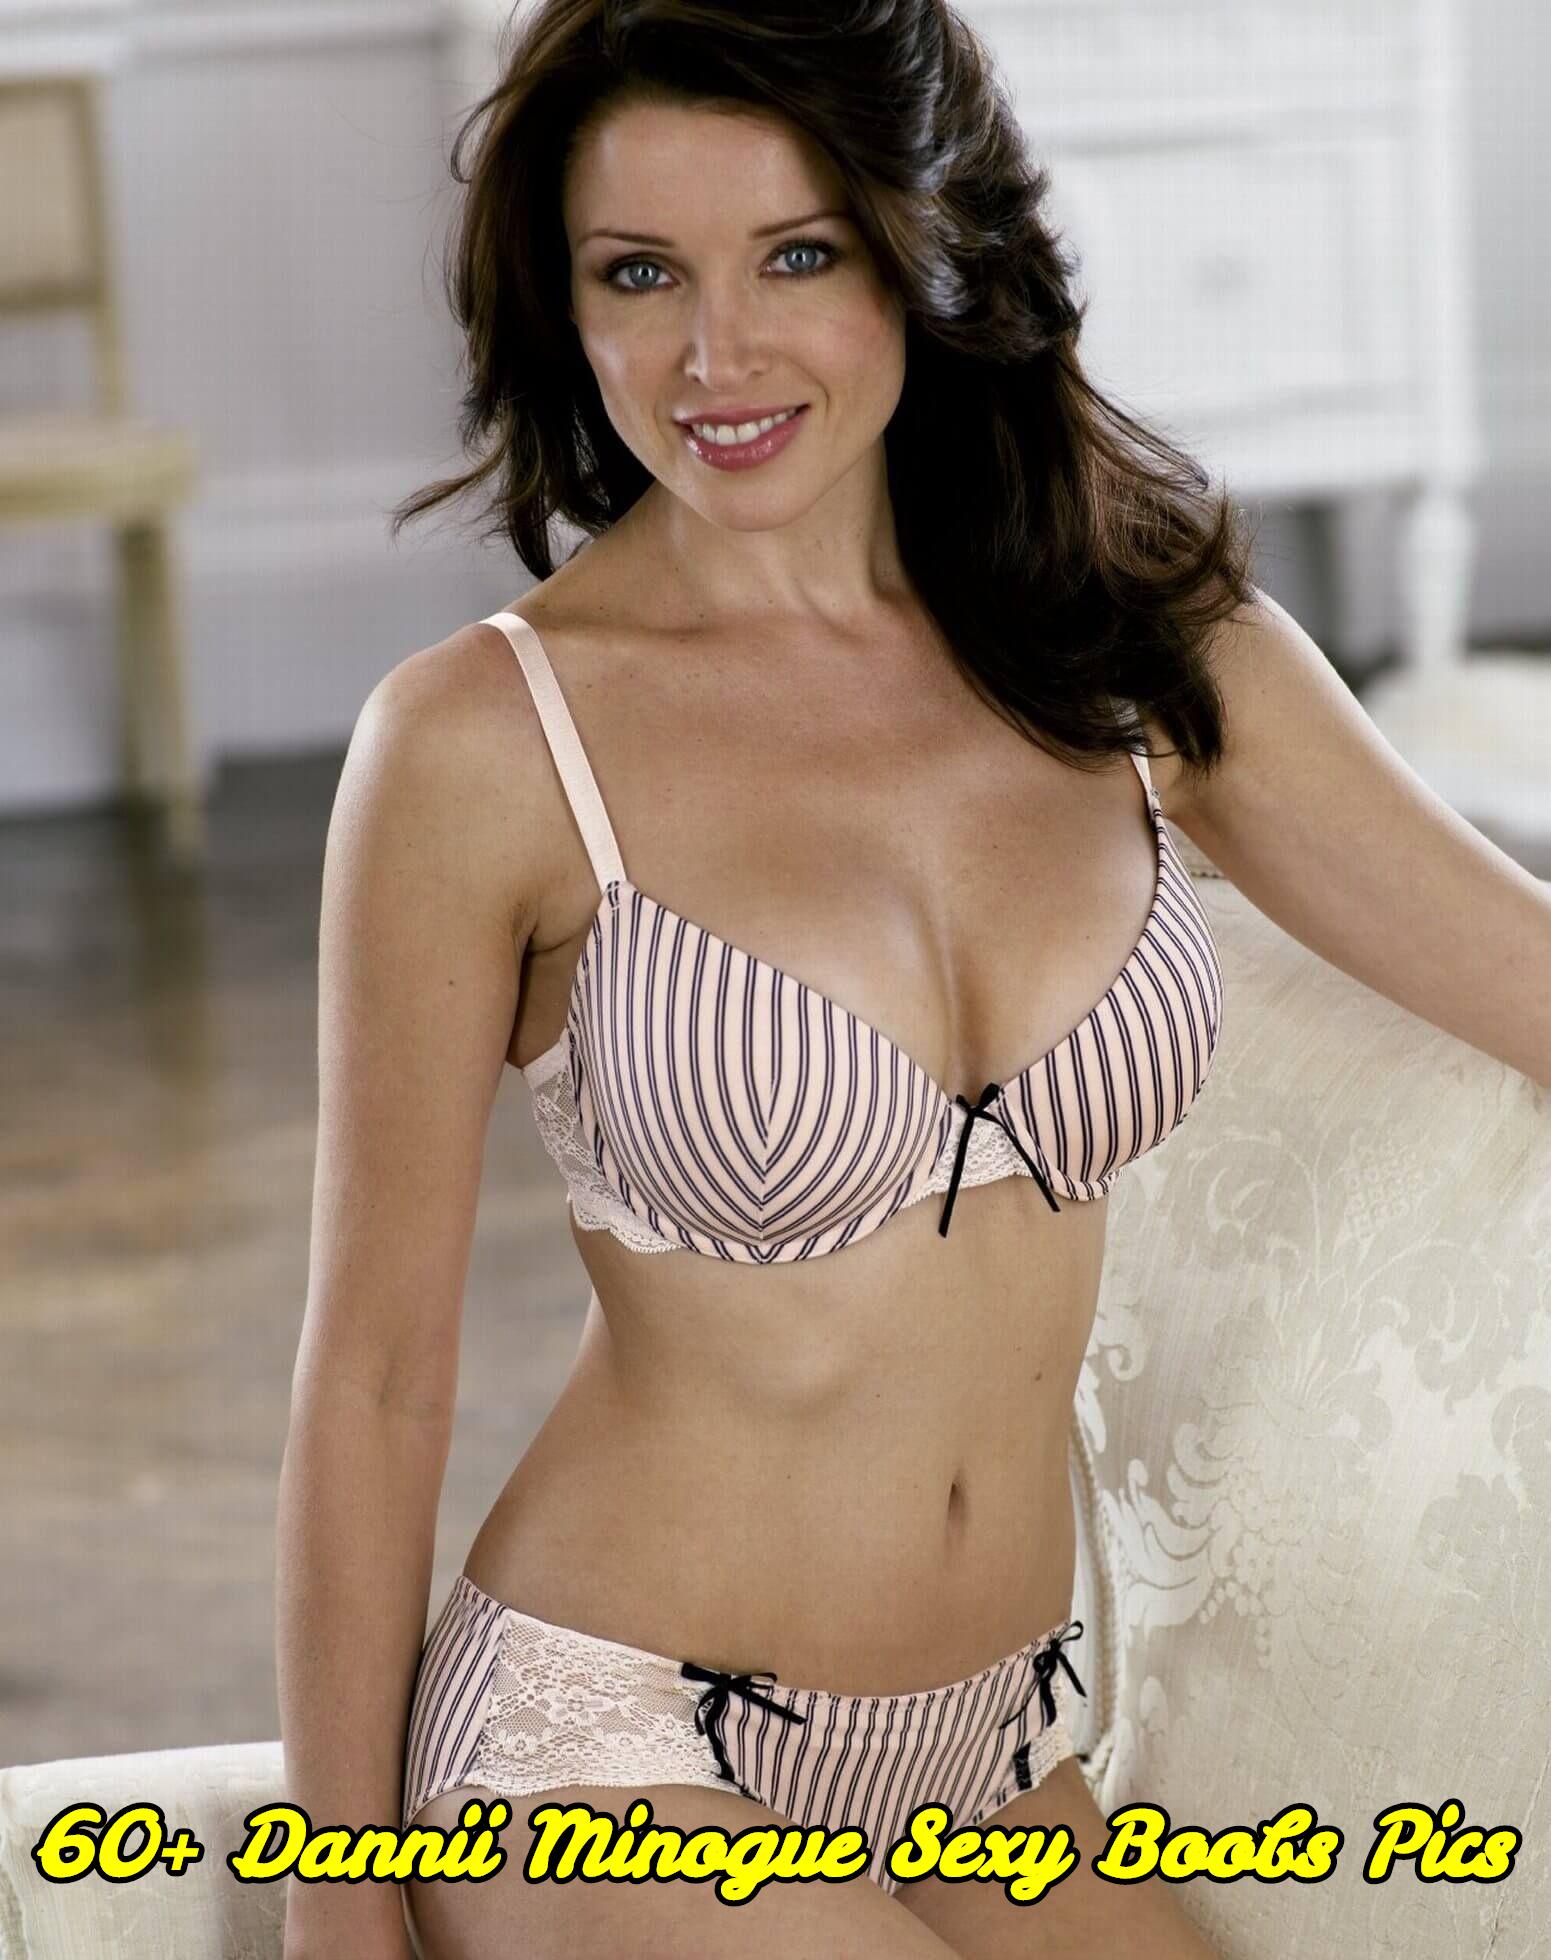 Dannii Minogue sexy boobs pics